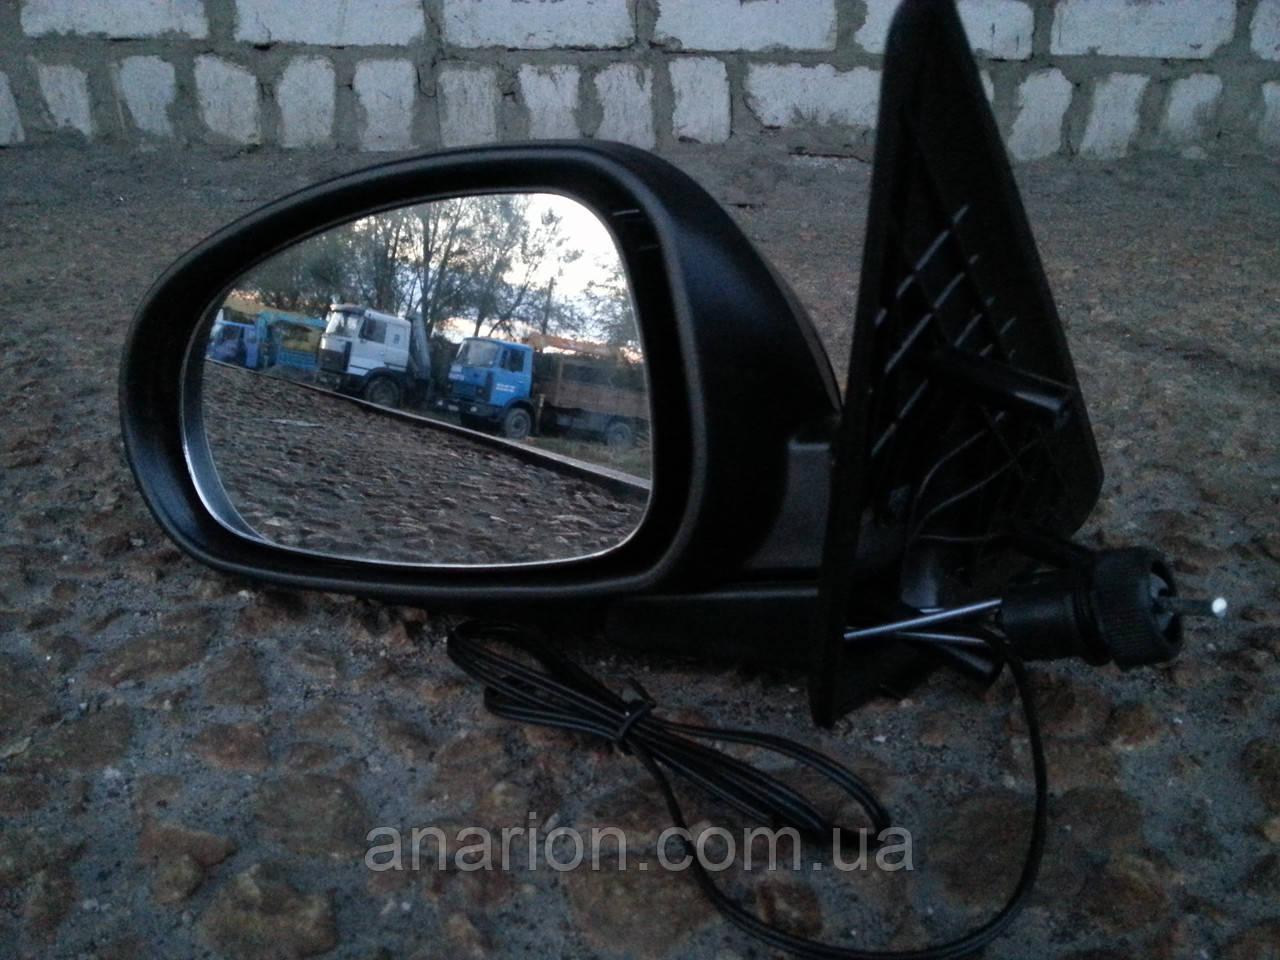 Зеркало боковое на ВАЗ 2110 с подогревом.